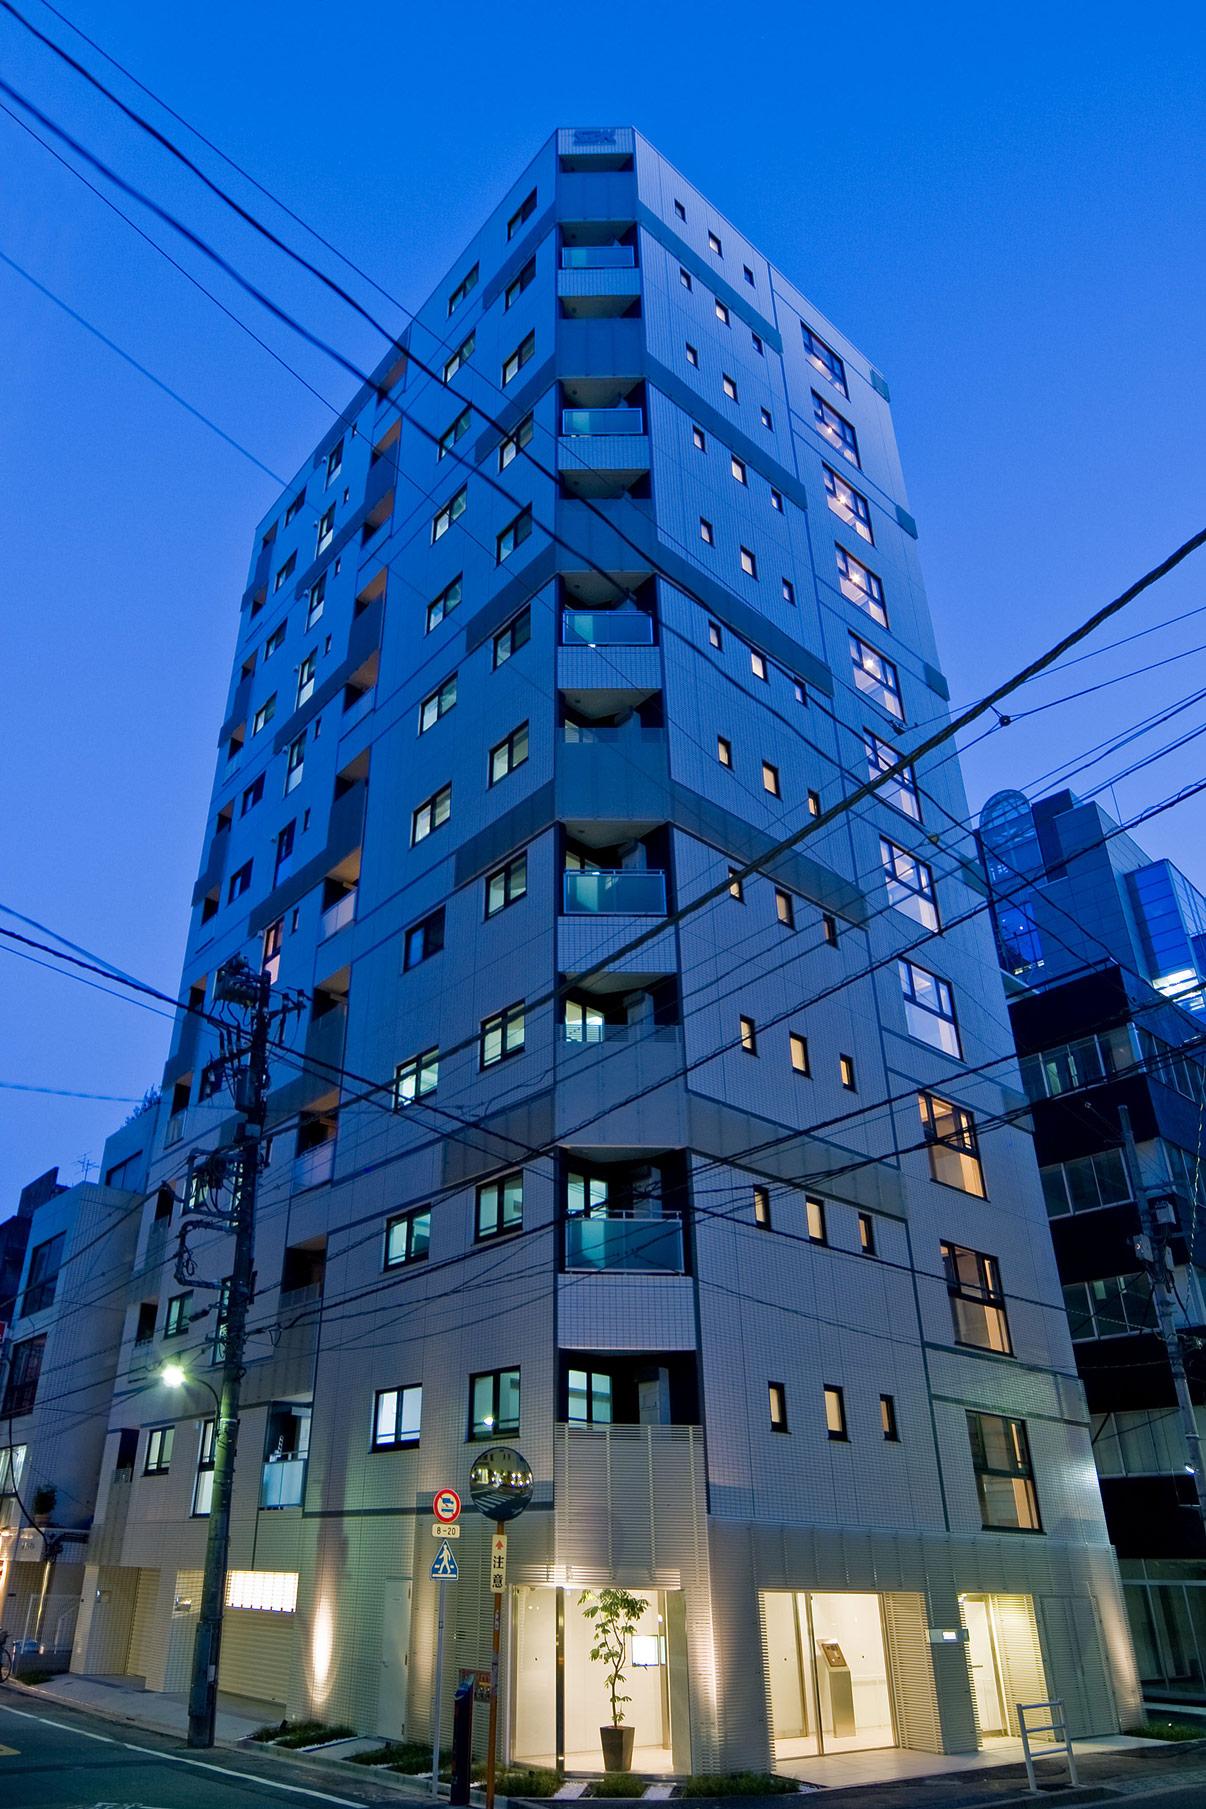 GREEN PARK 東日本橋 RESIDENCE | マンションギャラリー